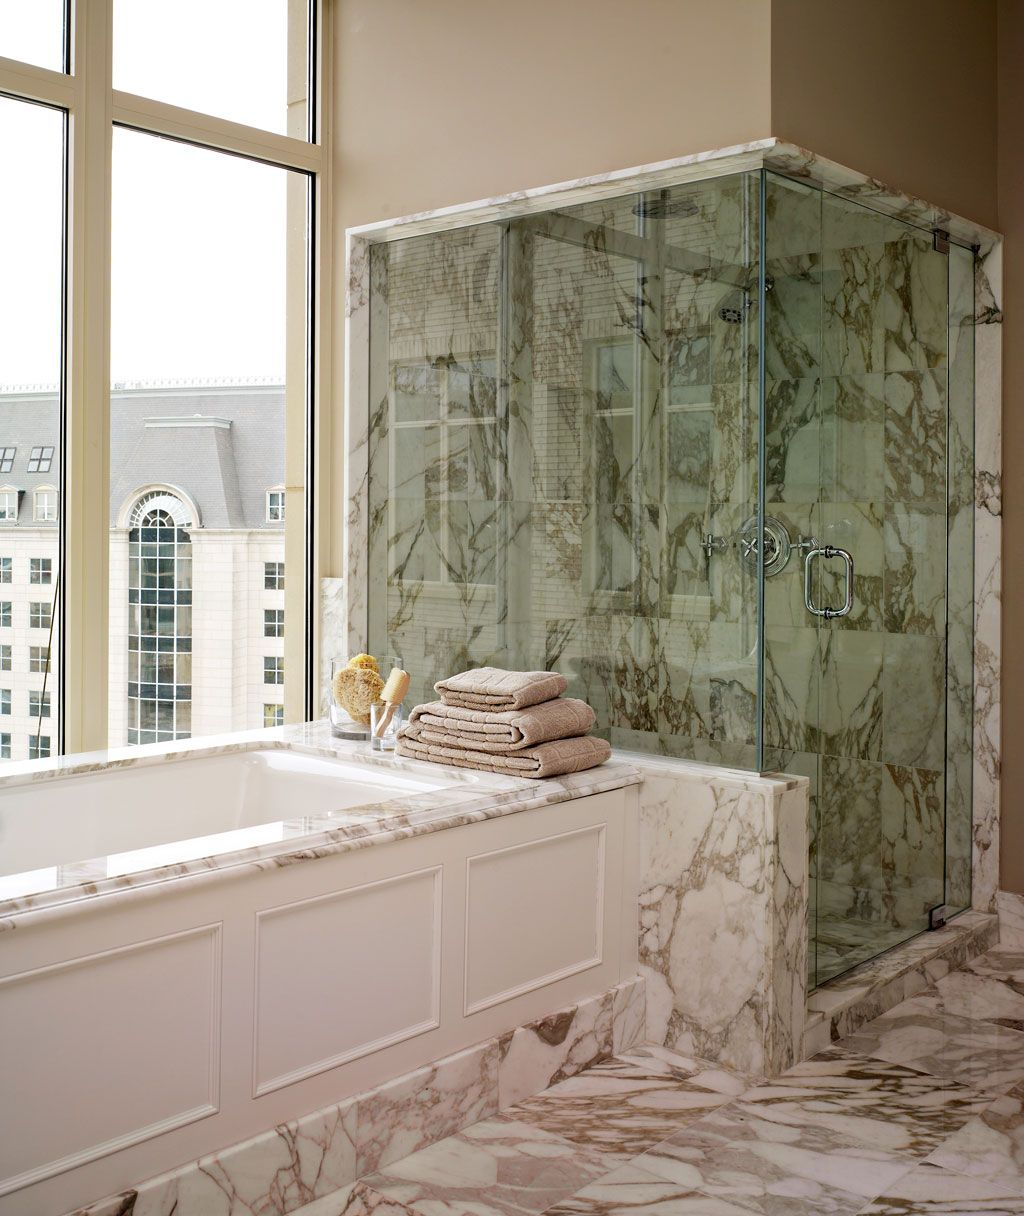 Dallas' Most Glamorous Bathrooms